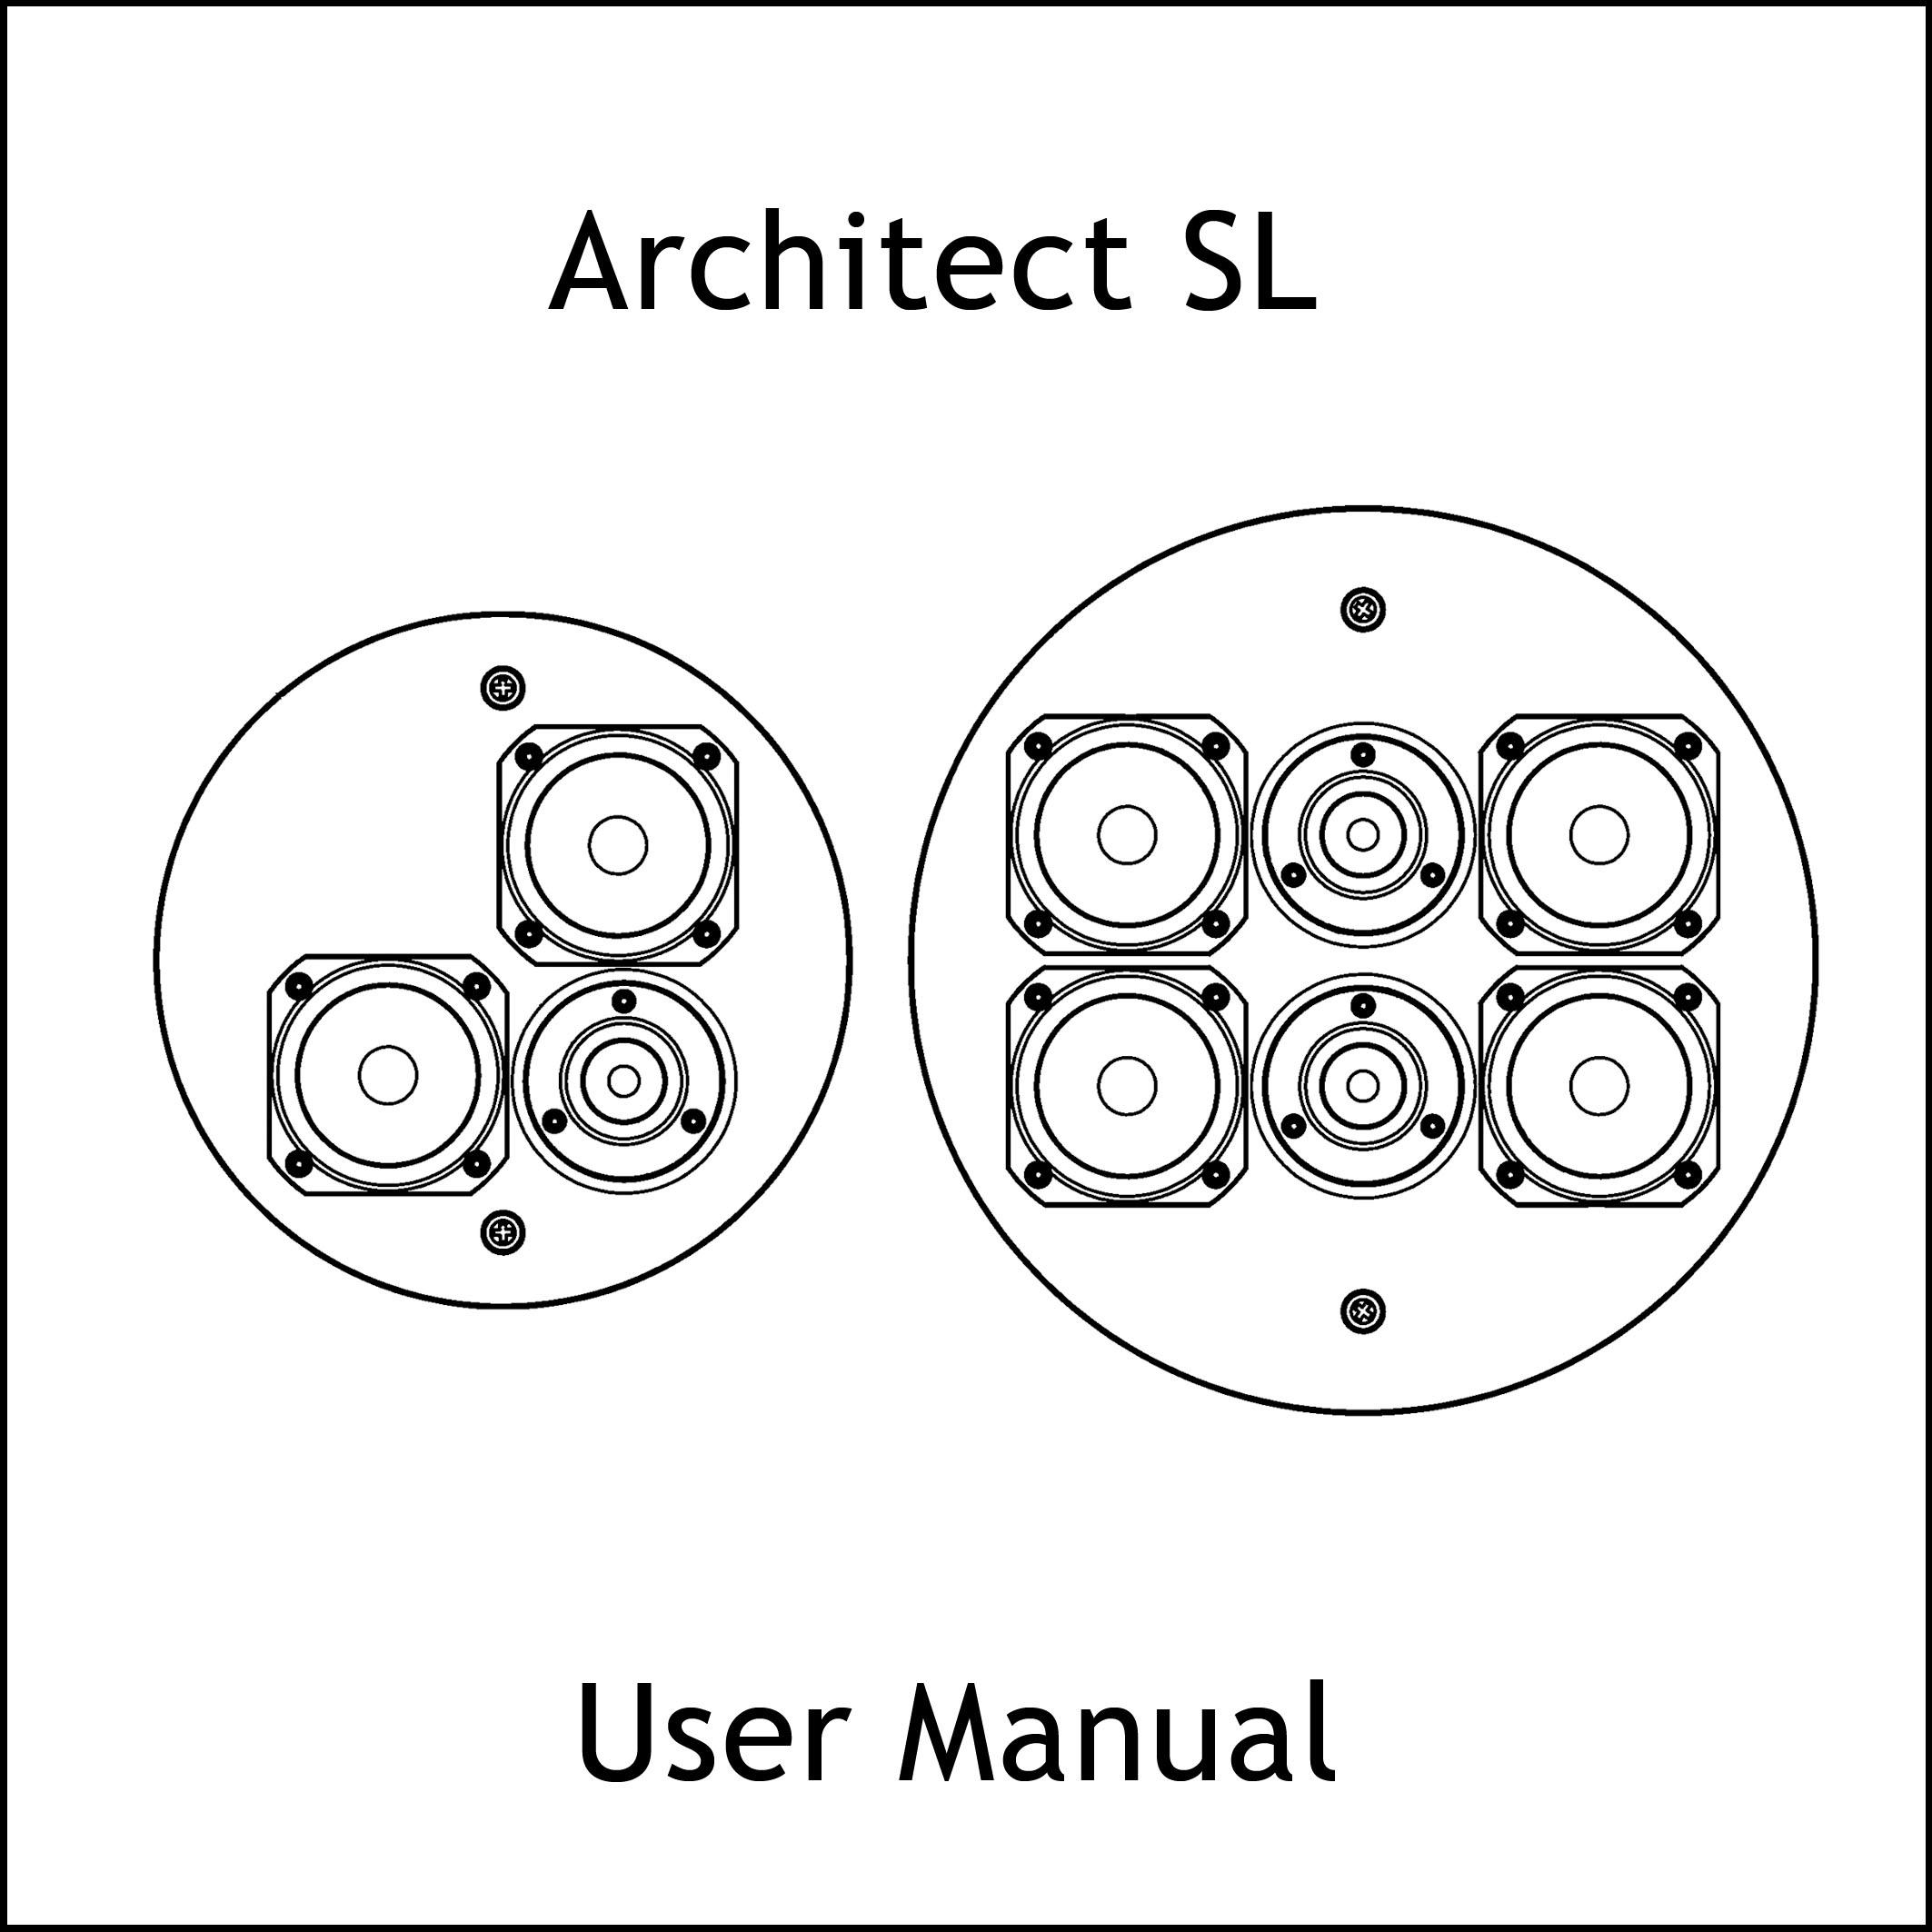 Manual icon array architect 4 2 sl u2014 artcoustic loudspeakers rh artcoustic